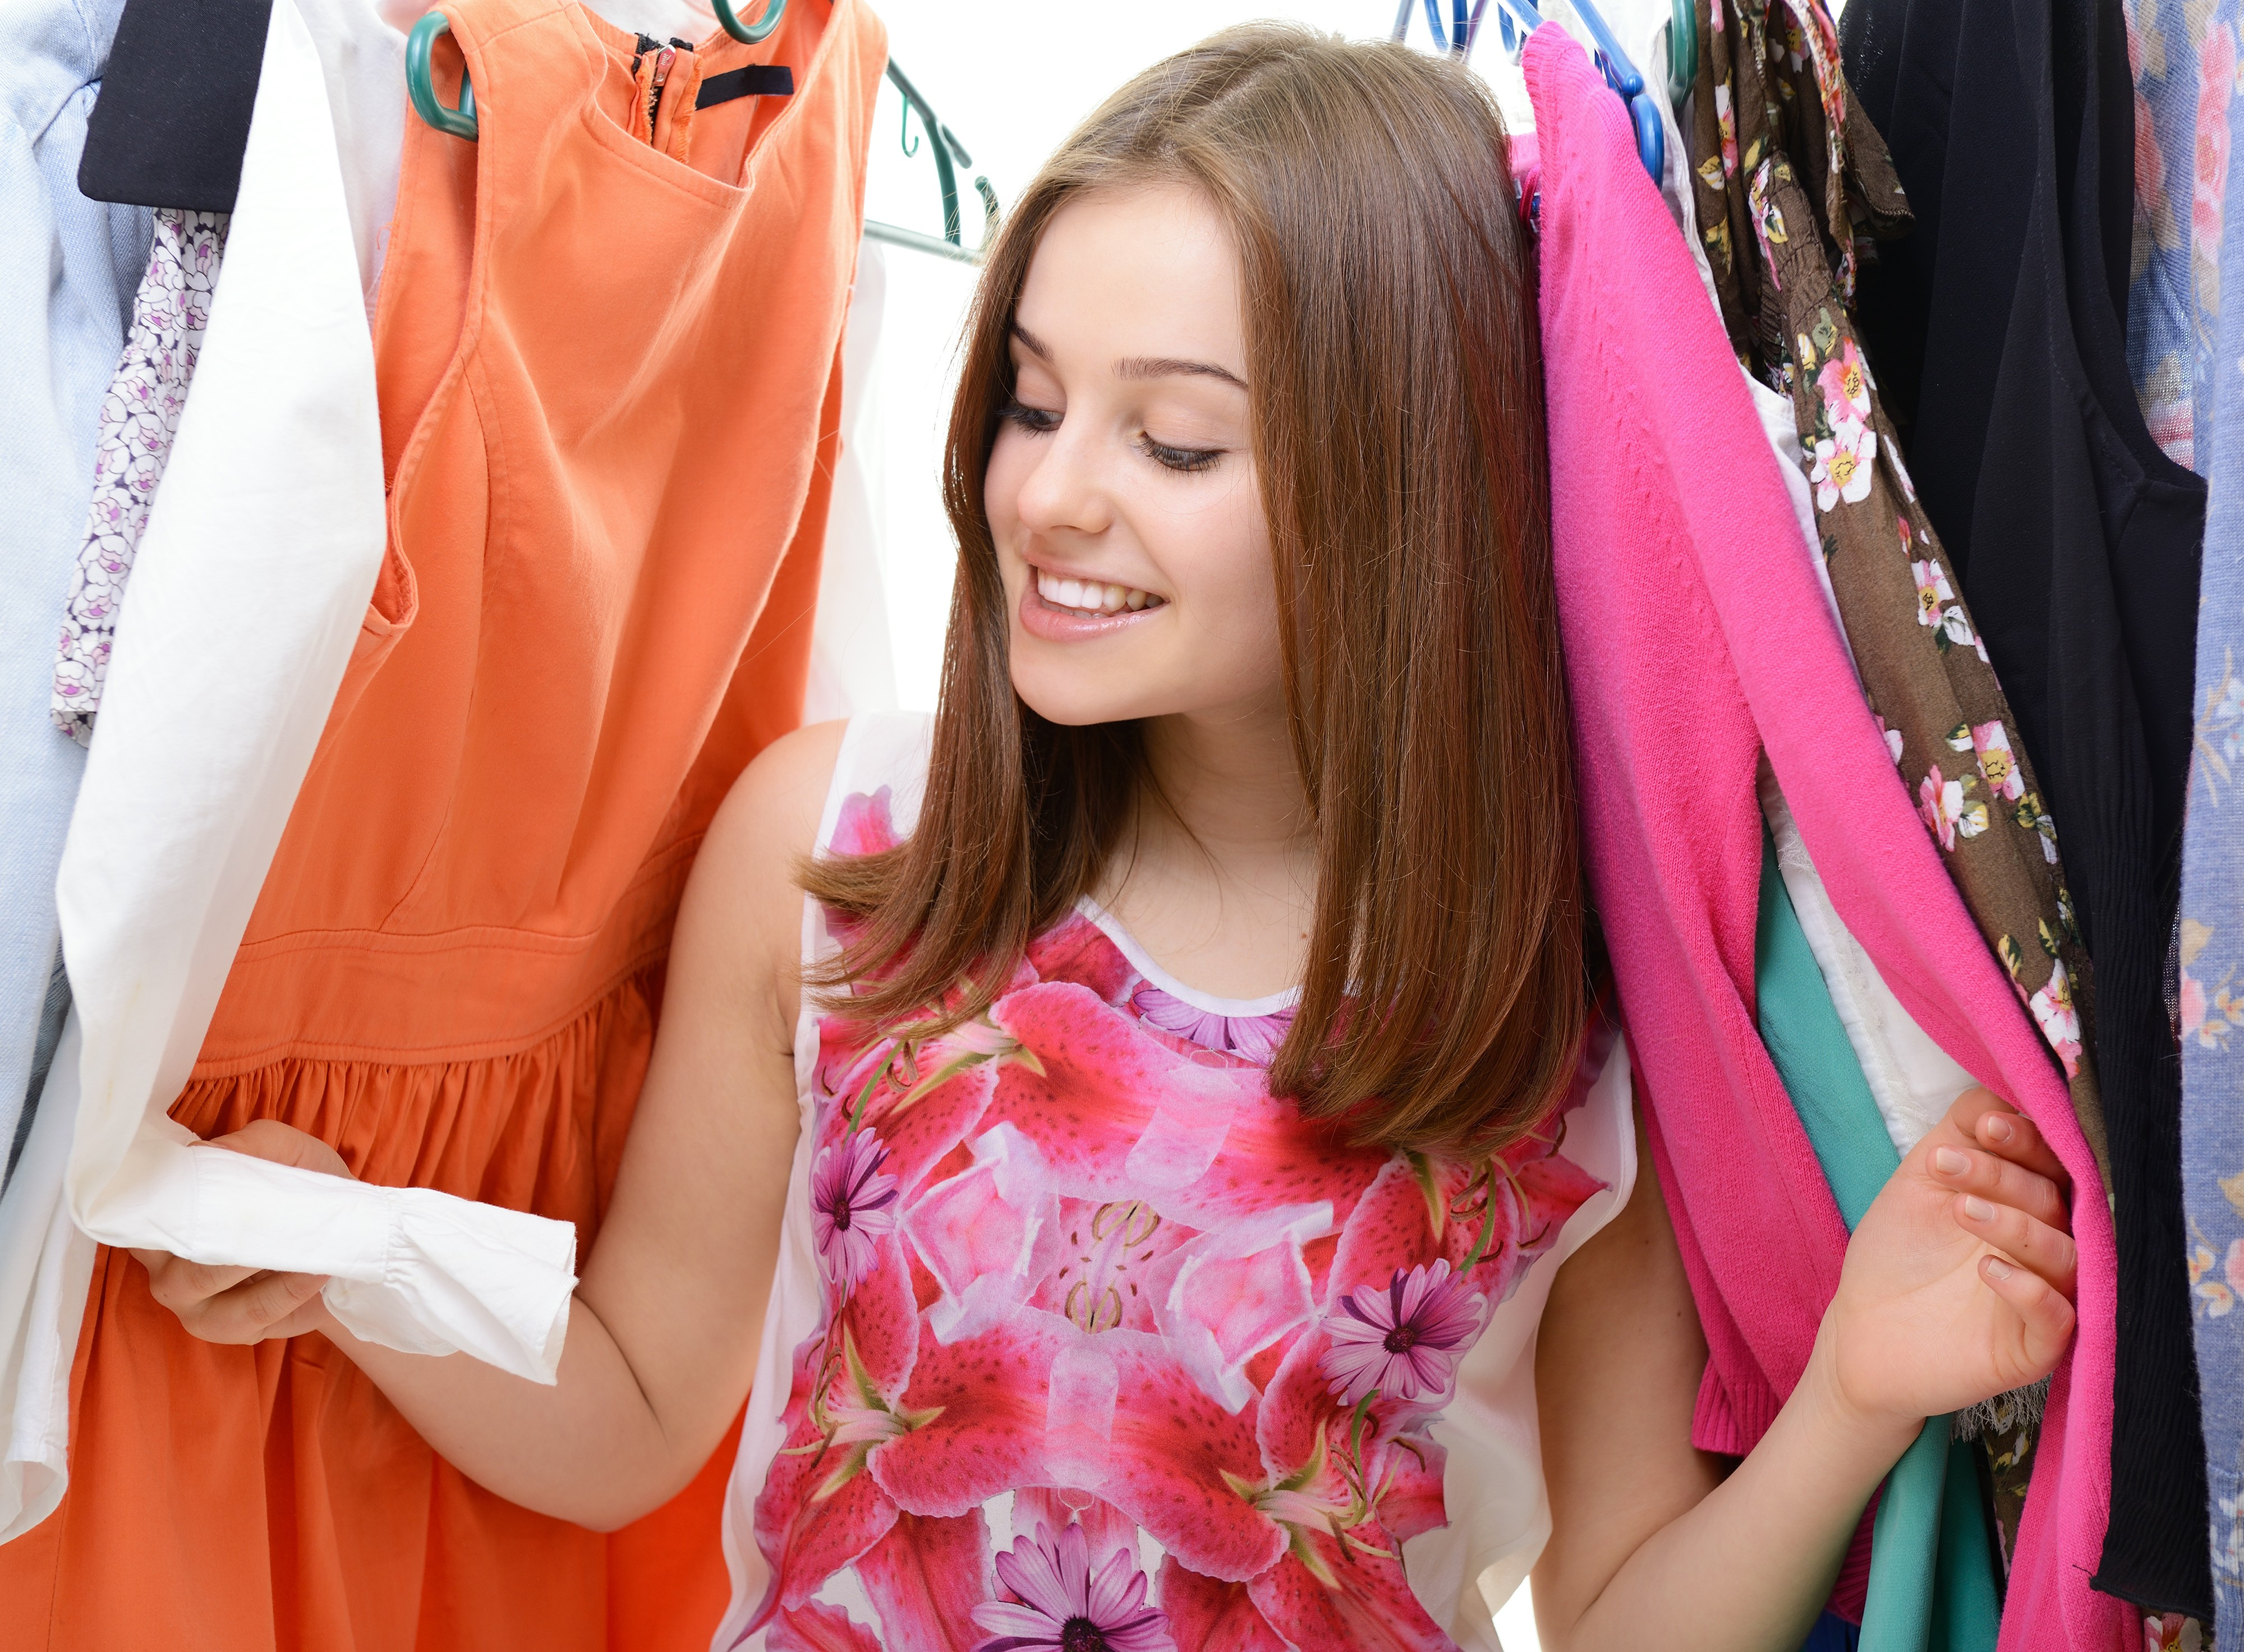 renovar o guarda-roupa